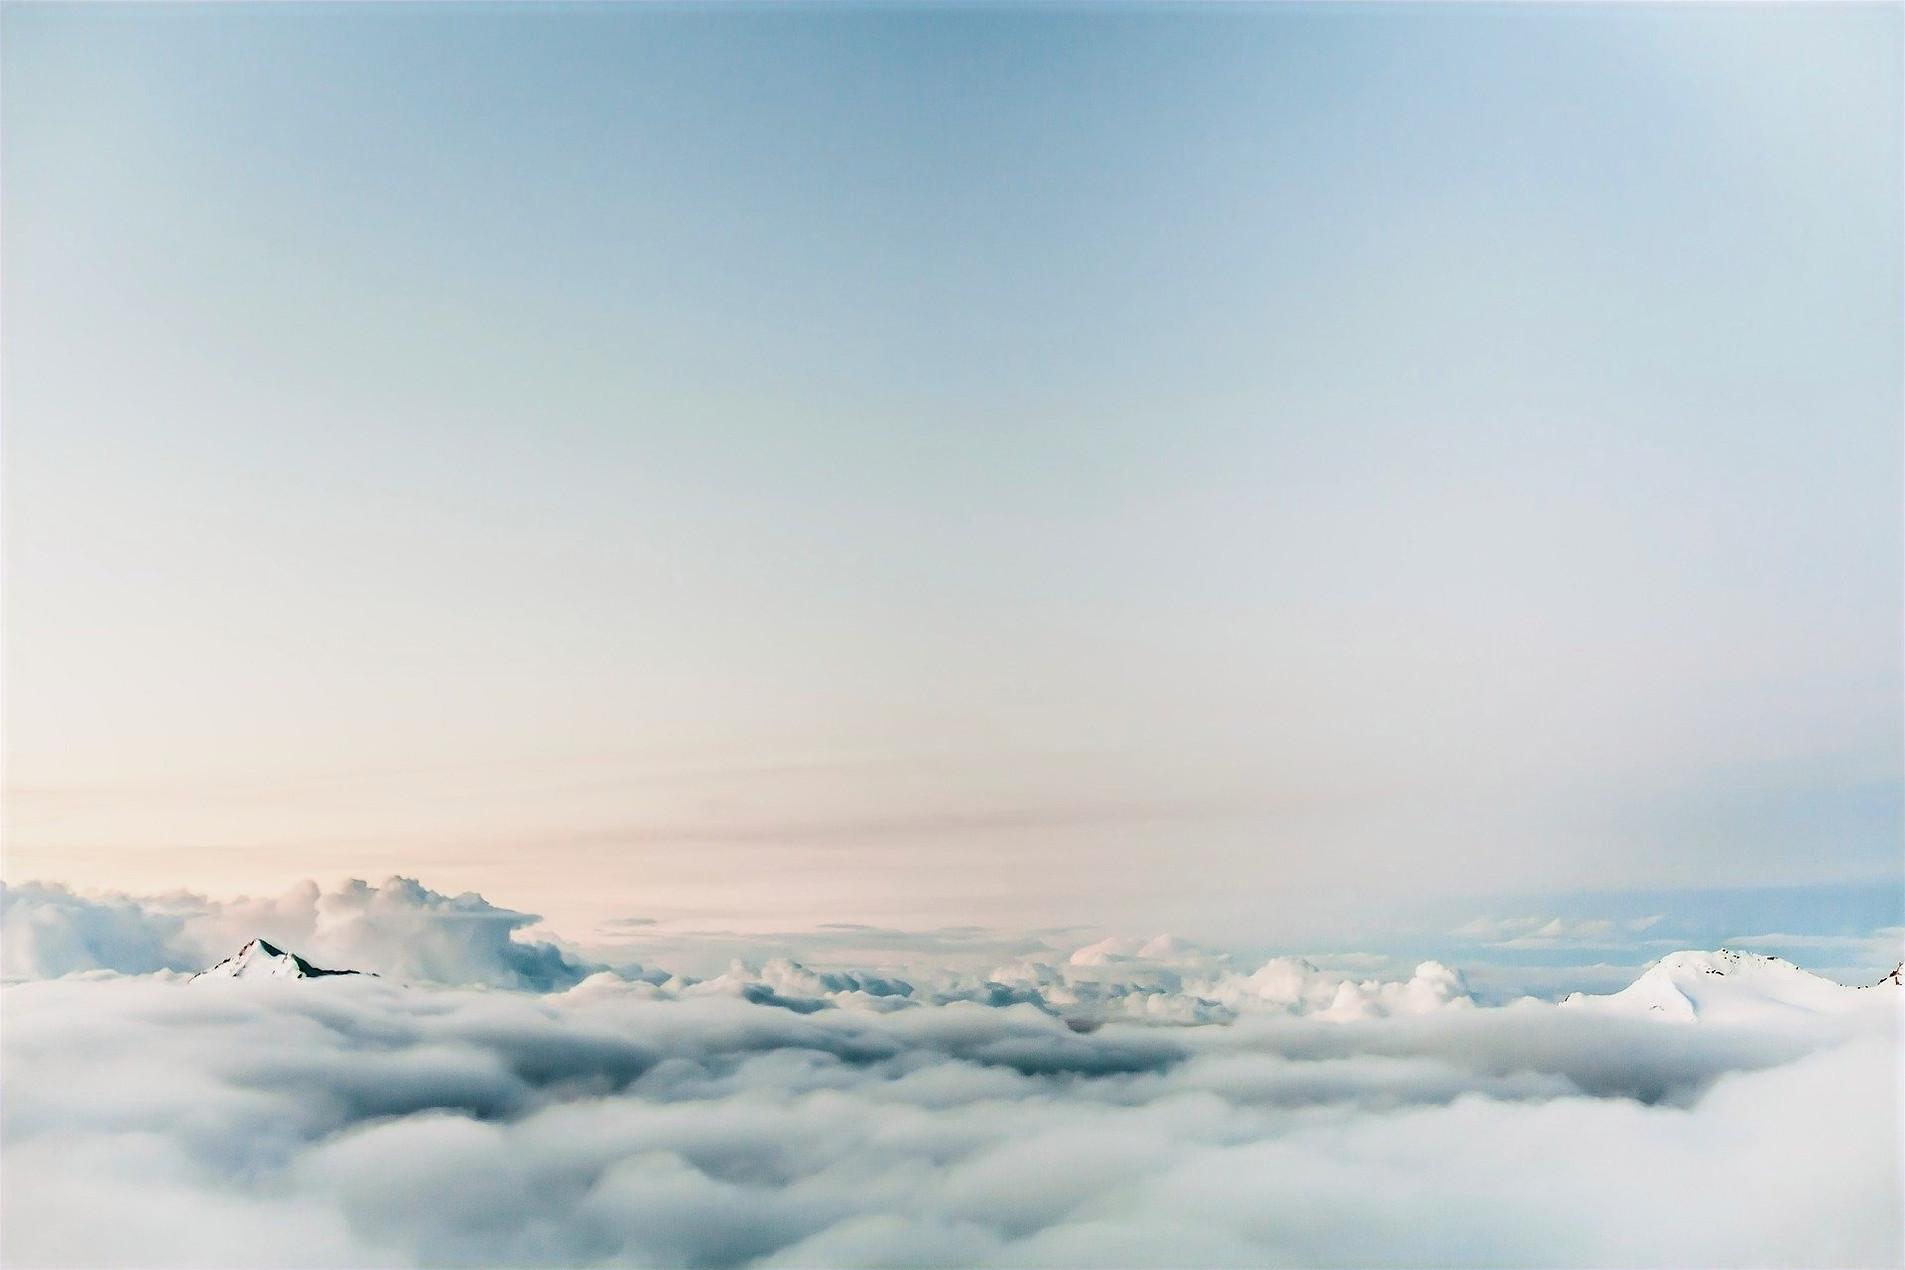 clouds-731260_1920%20(1)_edited.jpg